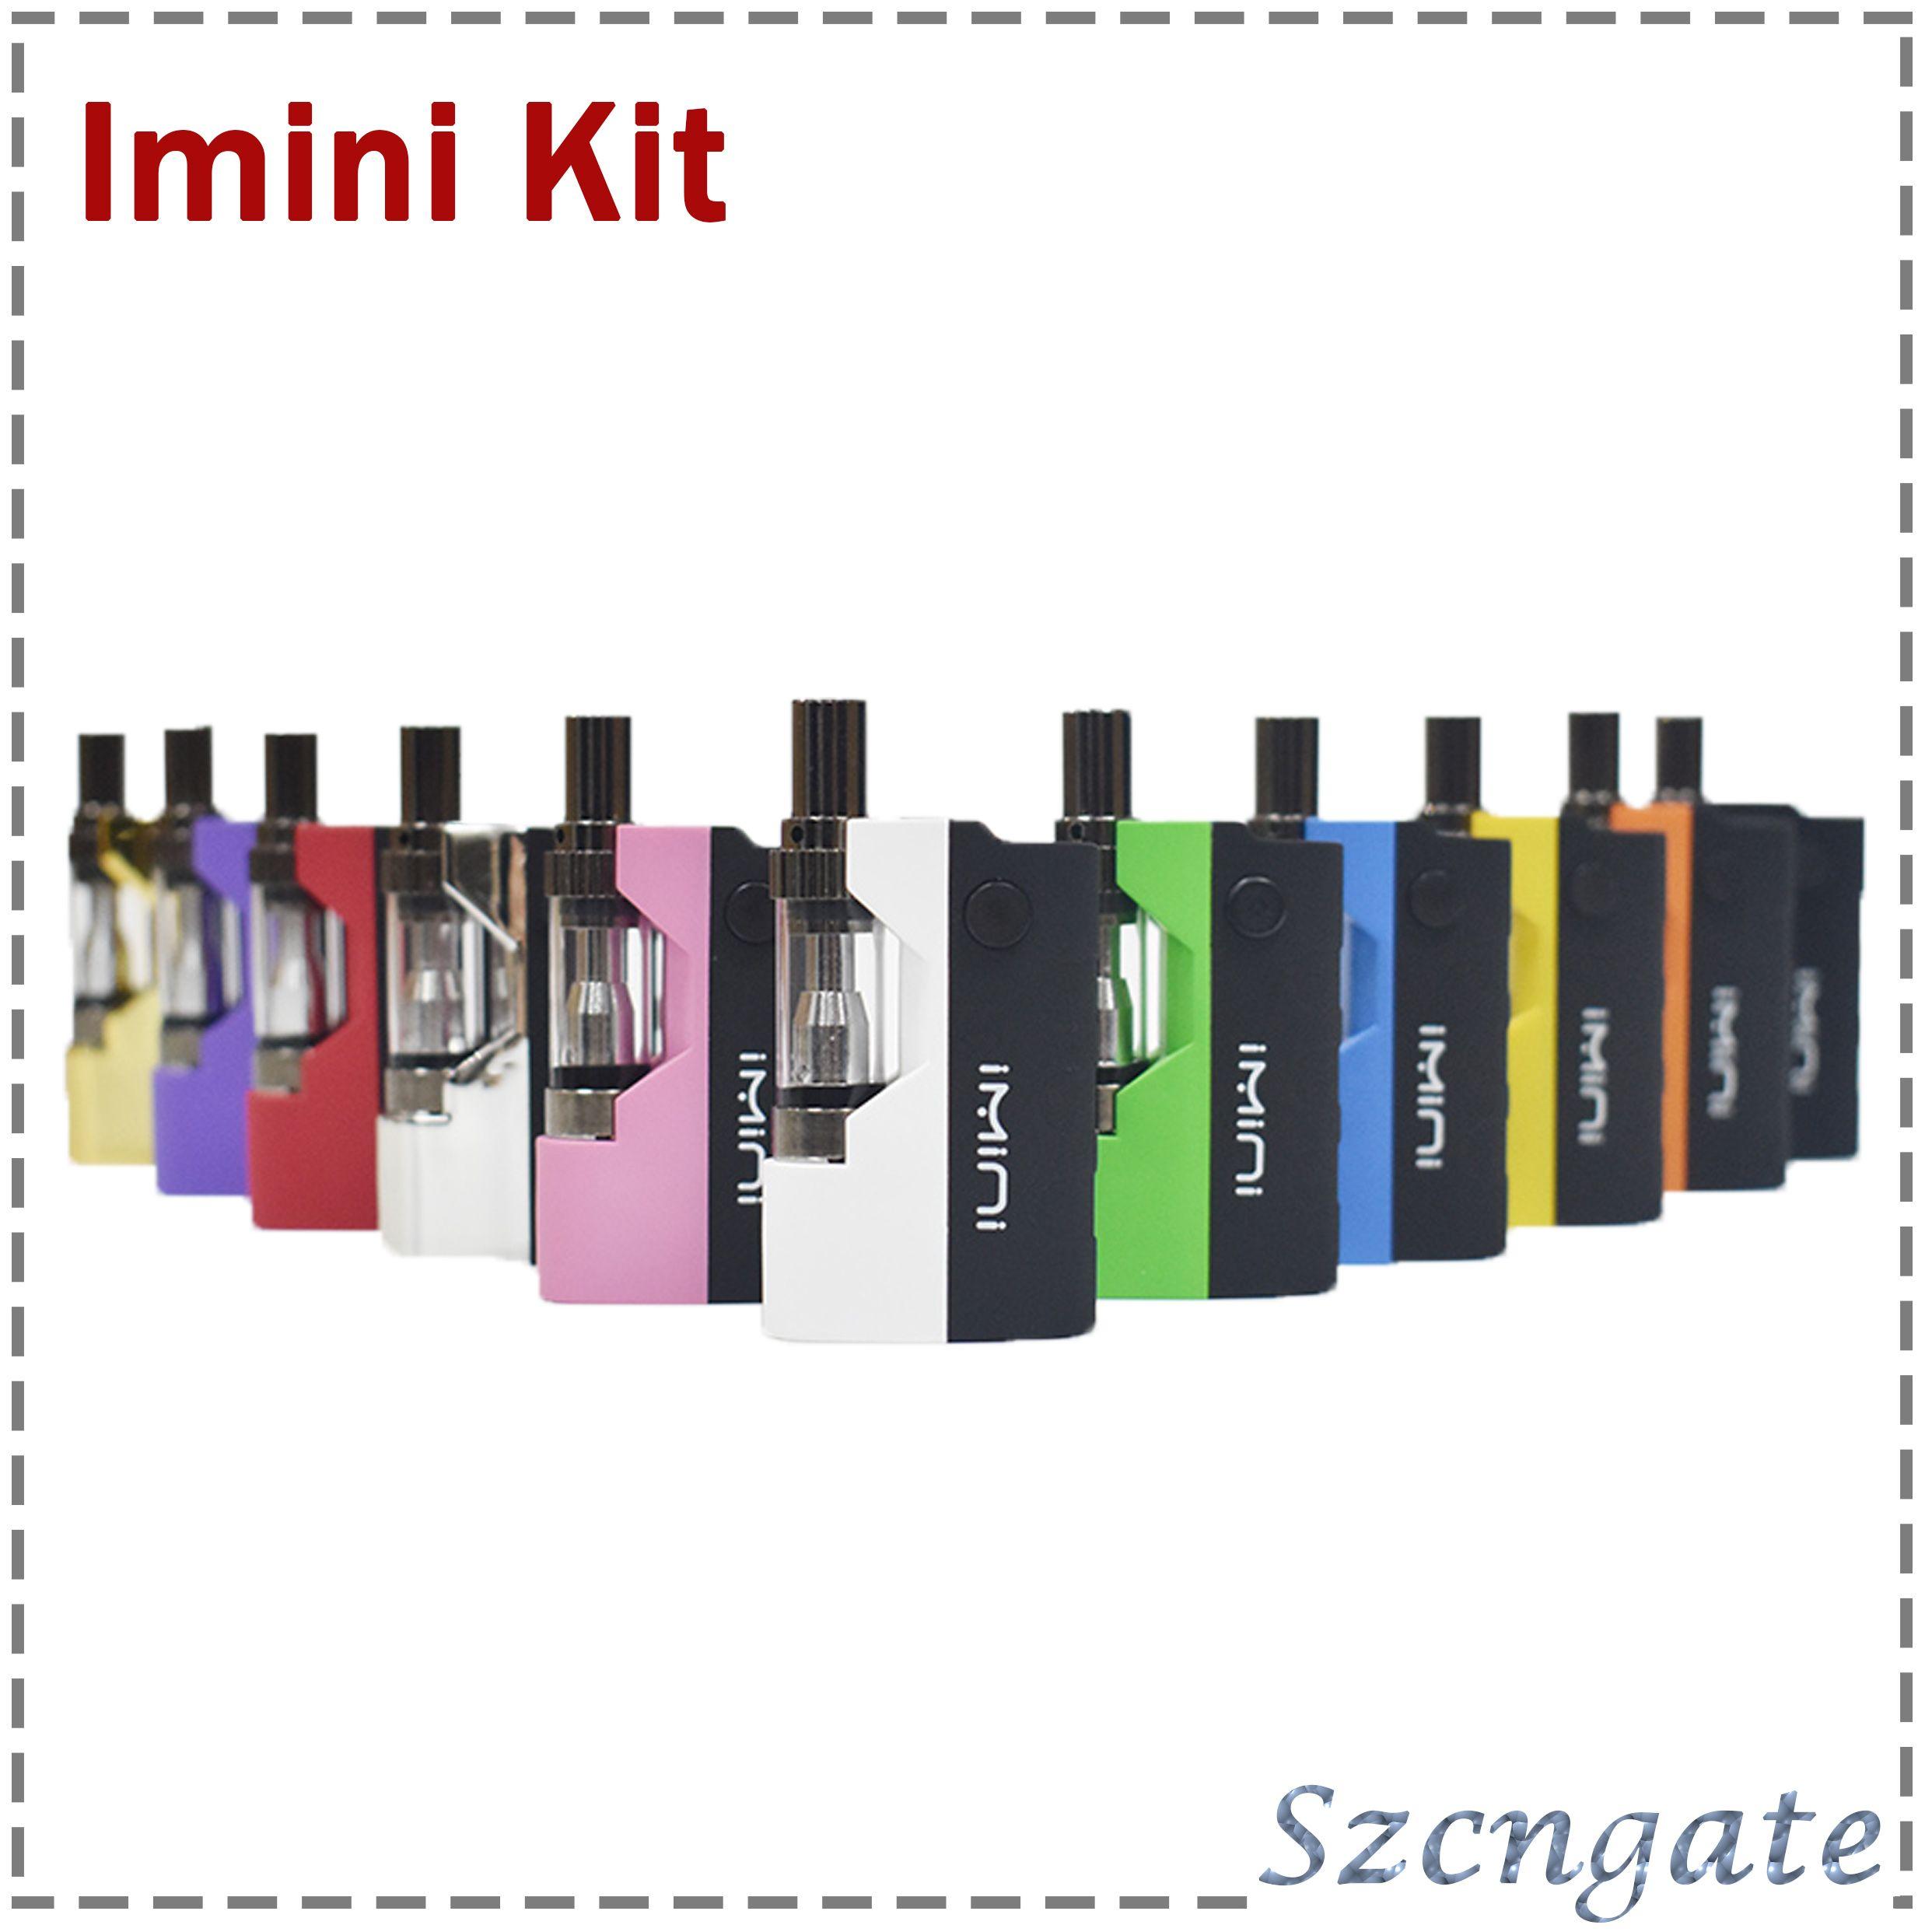 Original imini Thick oil Cartridges Vaporizer Kit 500mAh Box Mod Battery  510 Thread New Liberty V1 Tank Wax Atomizer vape pen 0268073